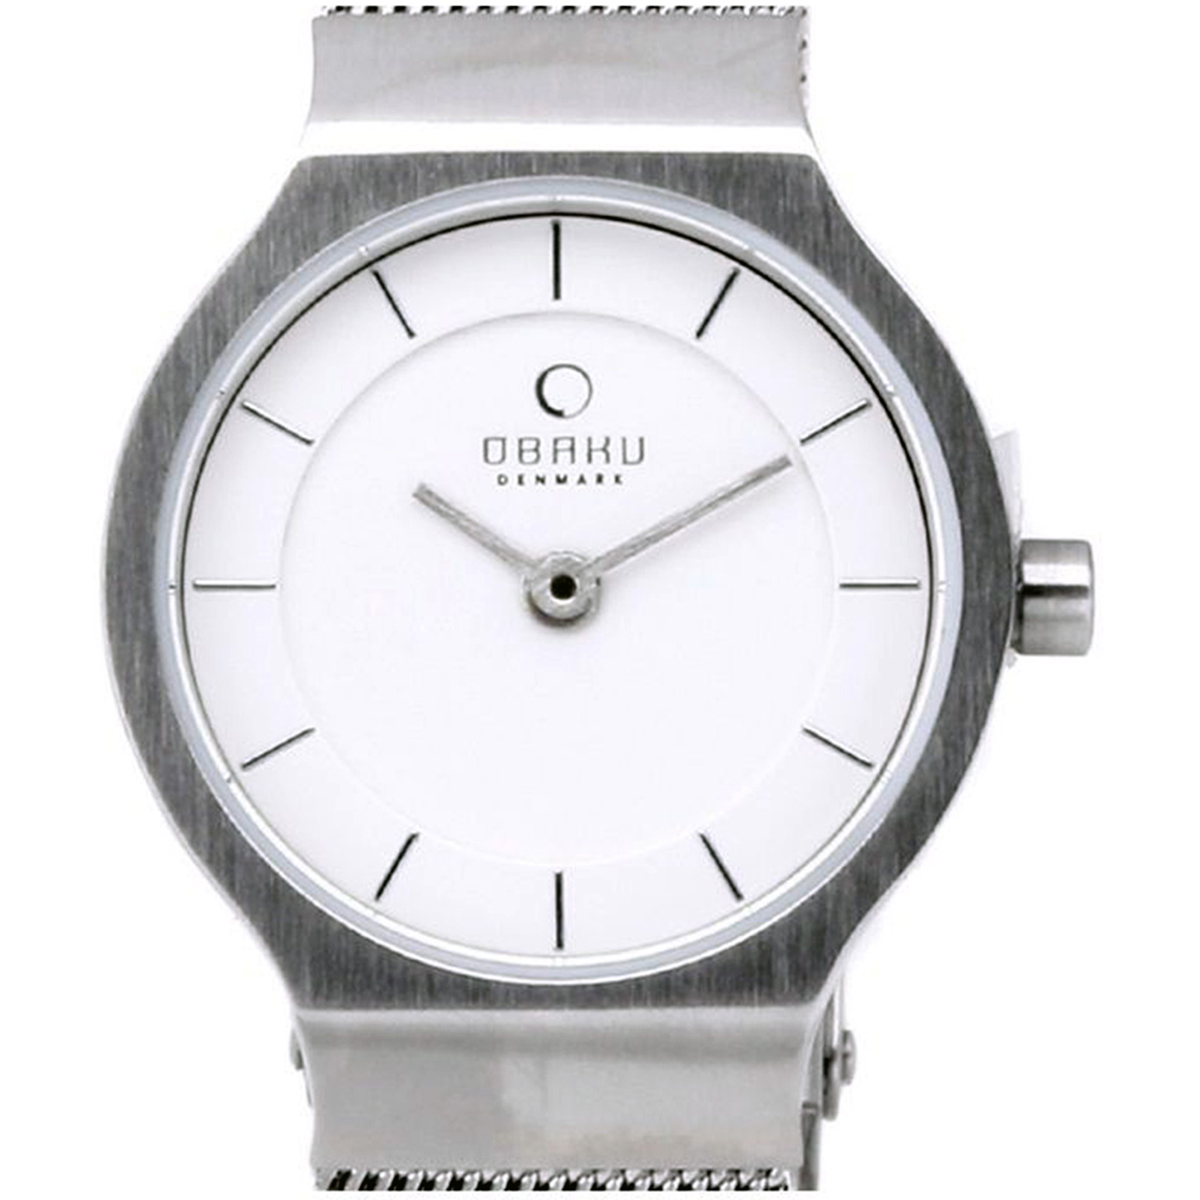 OBAKU オバック クォーツ 腕時計 デンマーク シンプル 薄型 ファッション [V133SCIMC] 並行輸入品 純正ケース メーカー保証